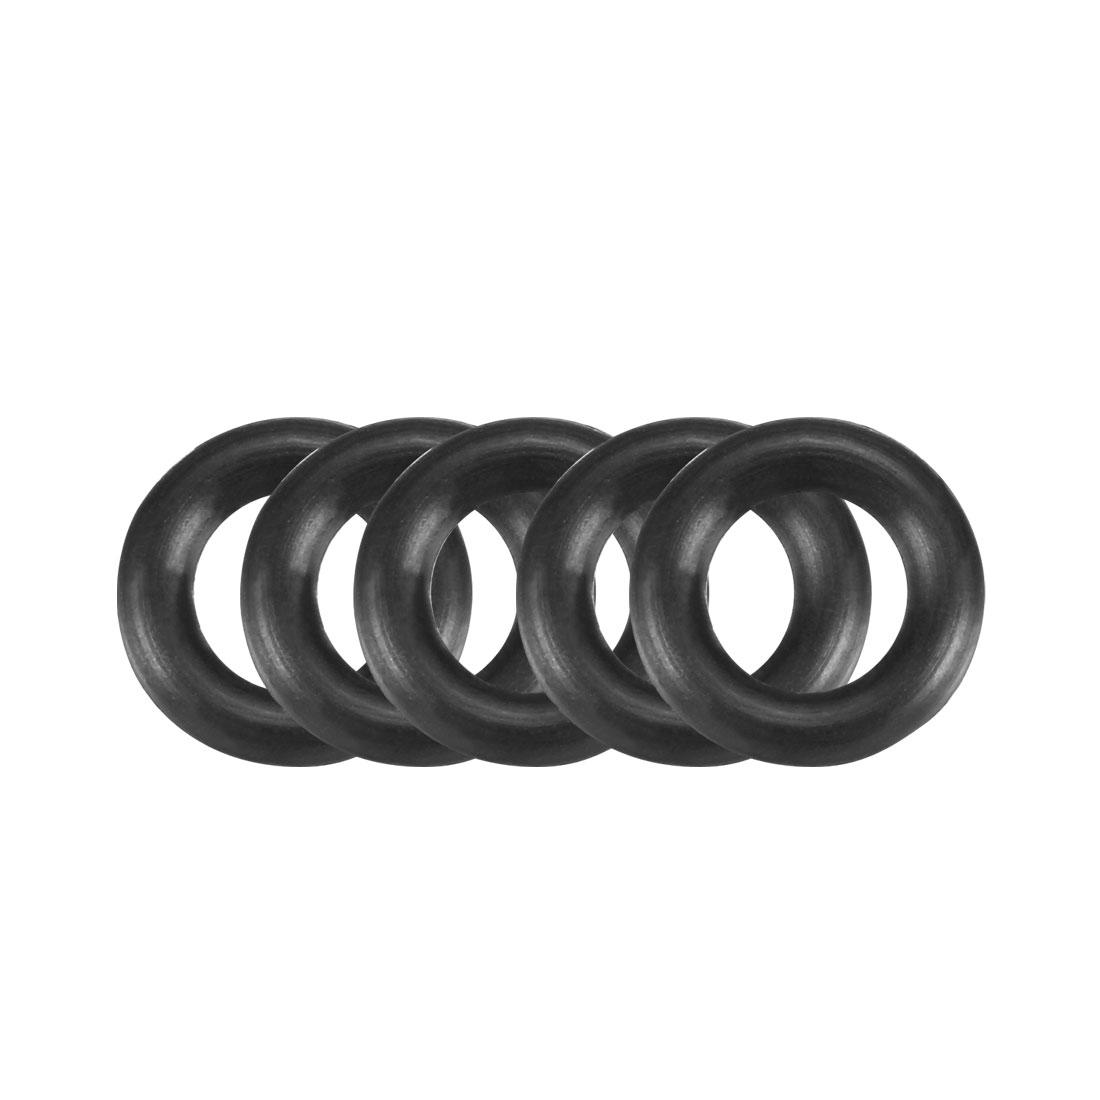 100Pcs Black 9 x 2mm Industrial Flexible Rubber O Ring Oil Sealing Grommets